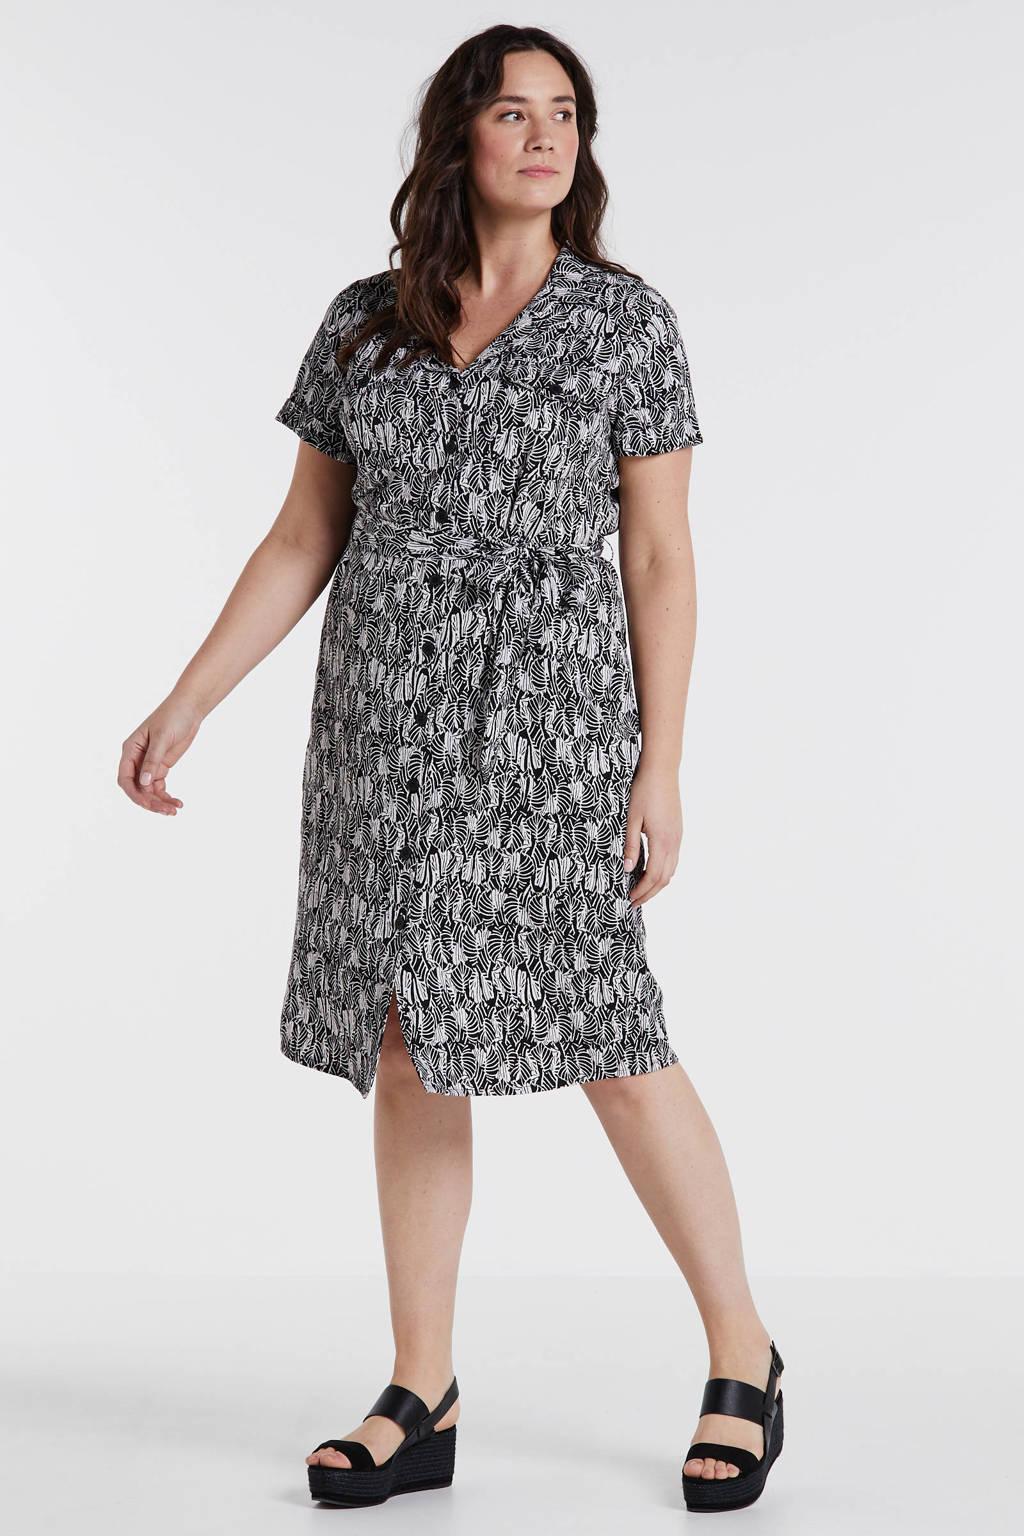 anytime blousejurk Plus size met bladprint zwart/ecru, Zwart/ecru